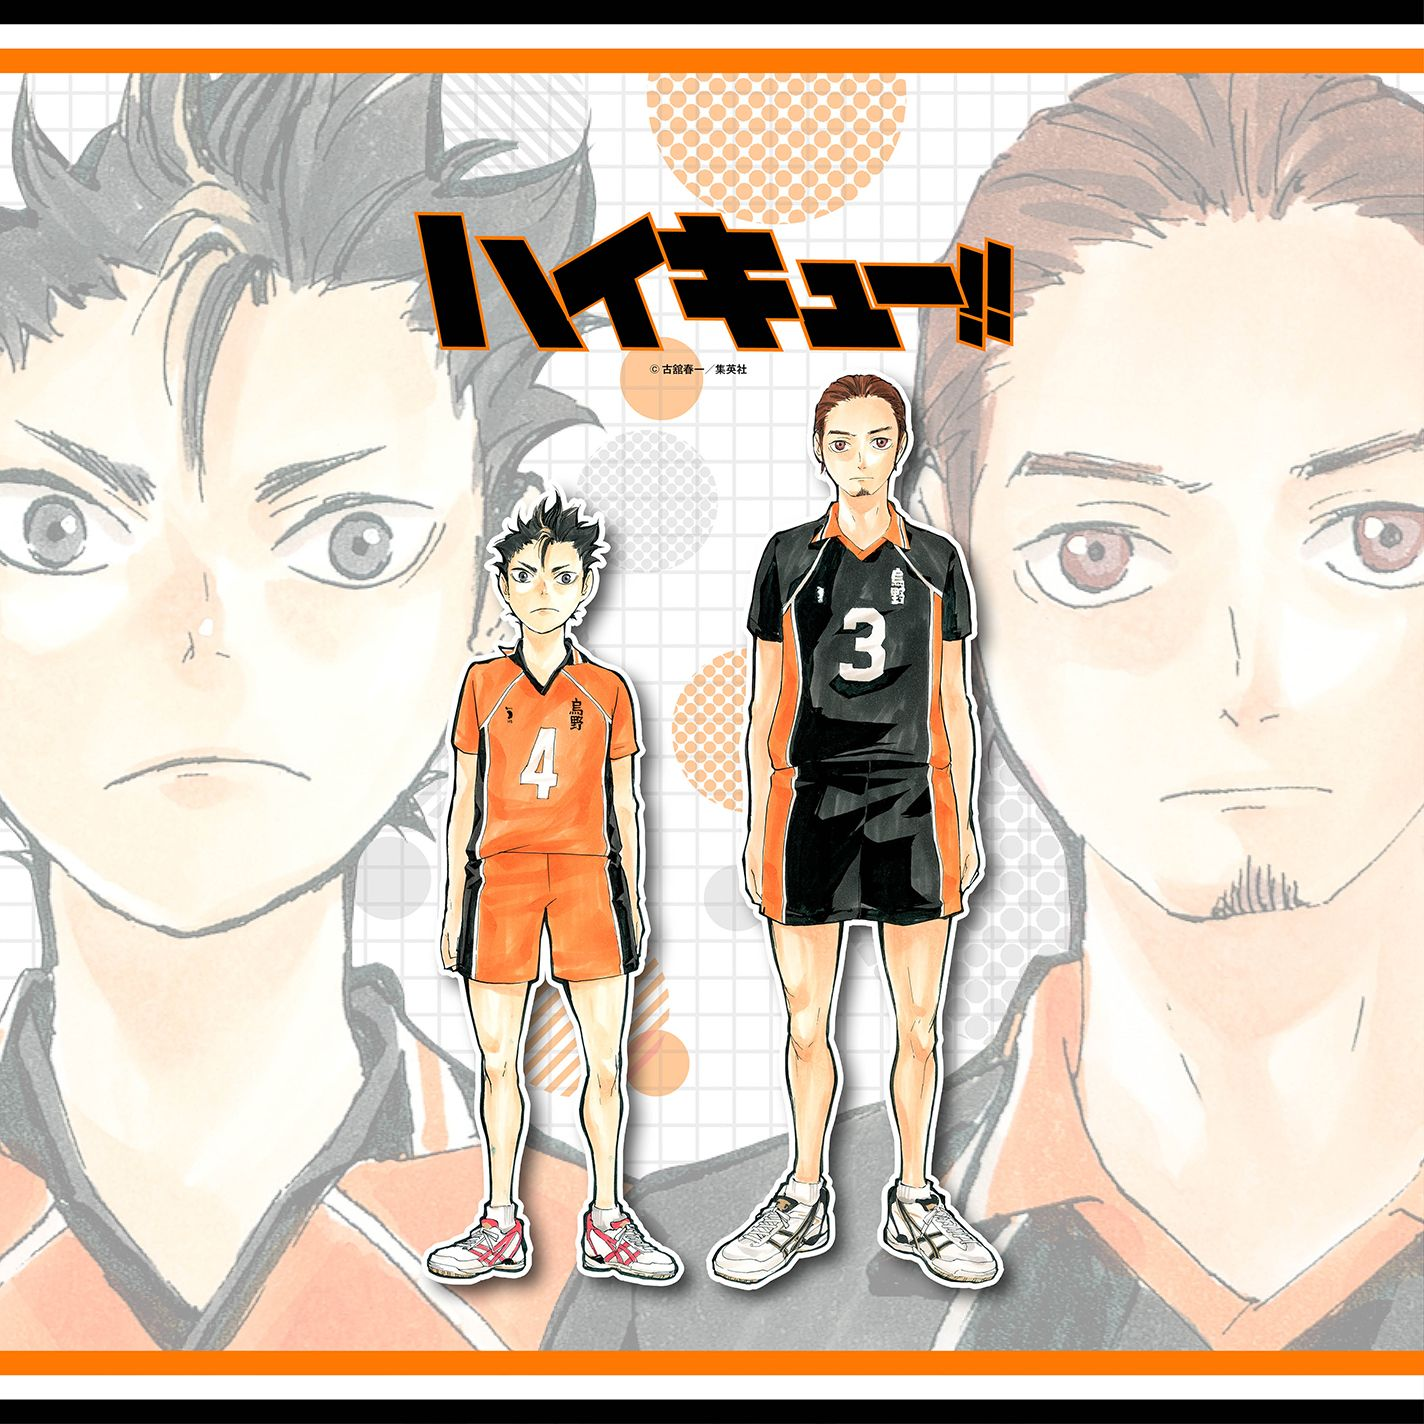 Asahi And Nishinoya ハイキュー壁紙 ハイキュー 少年ジャンプ